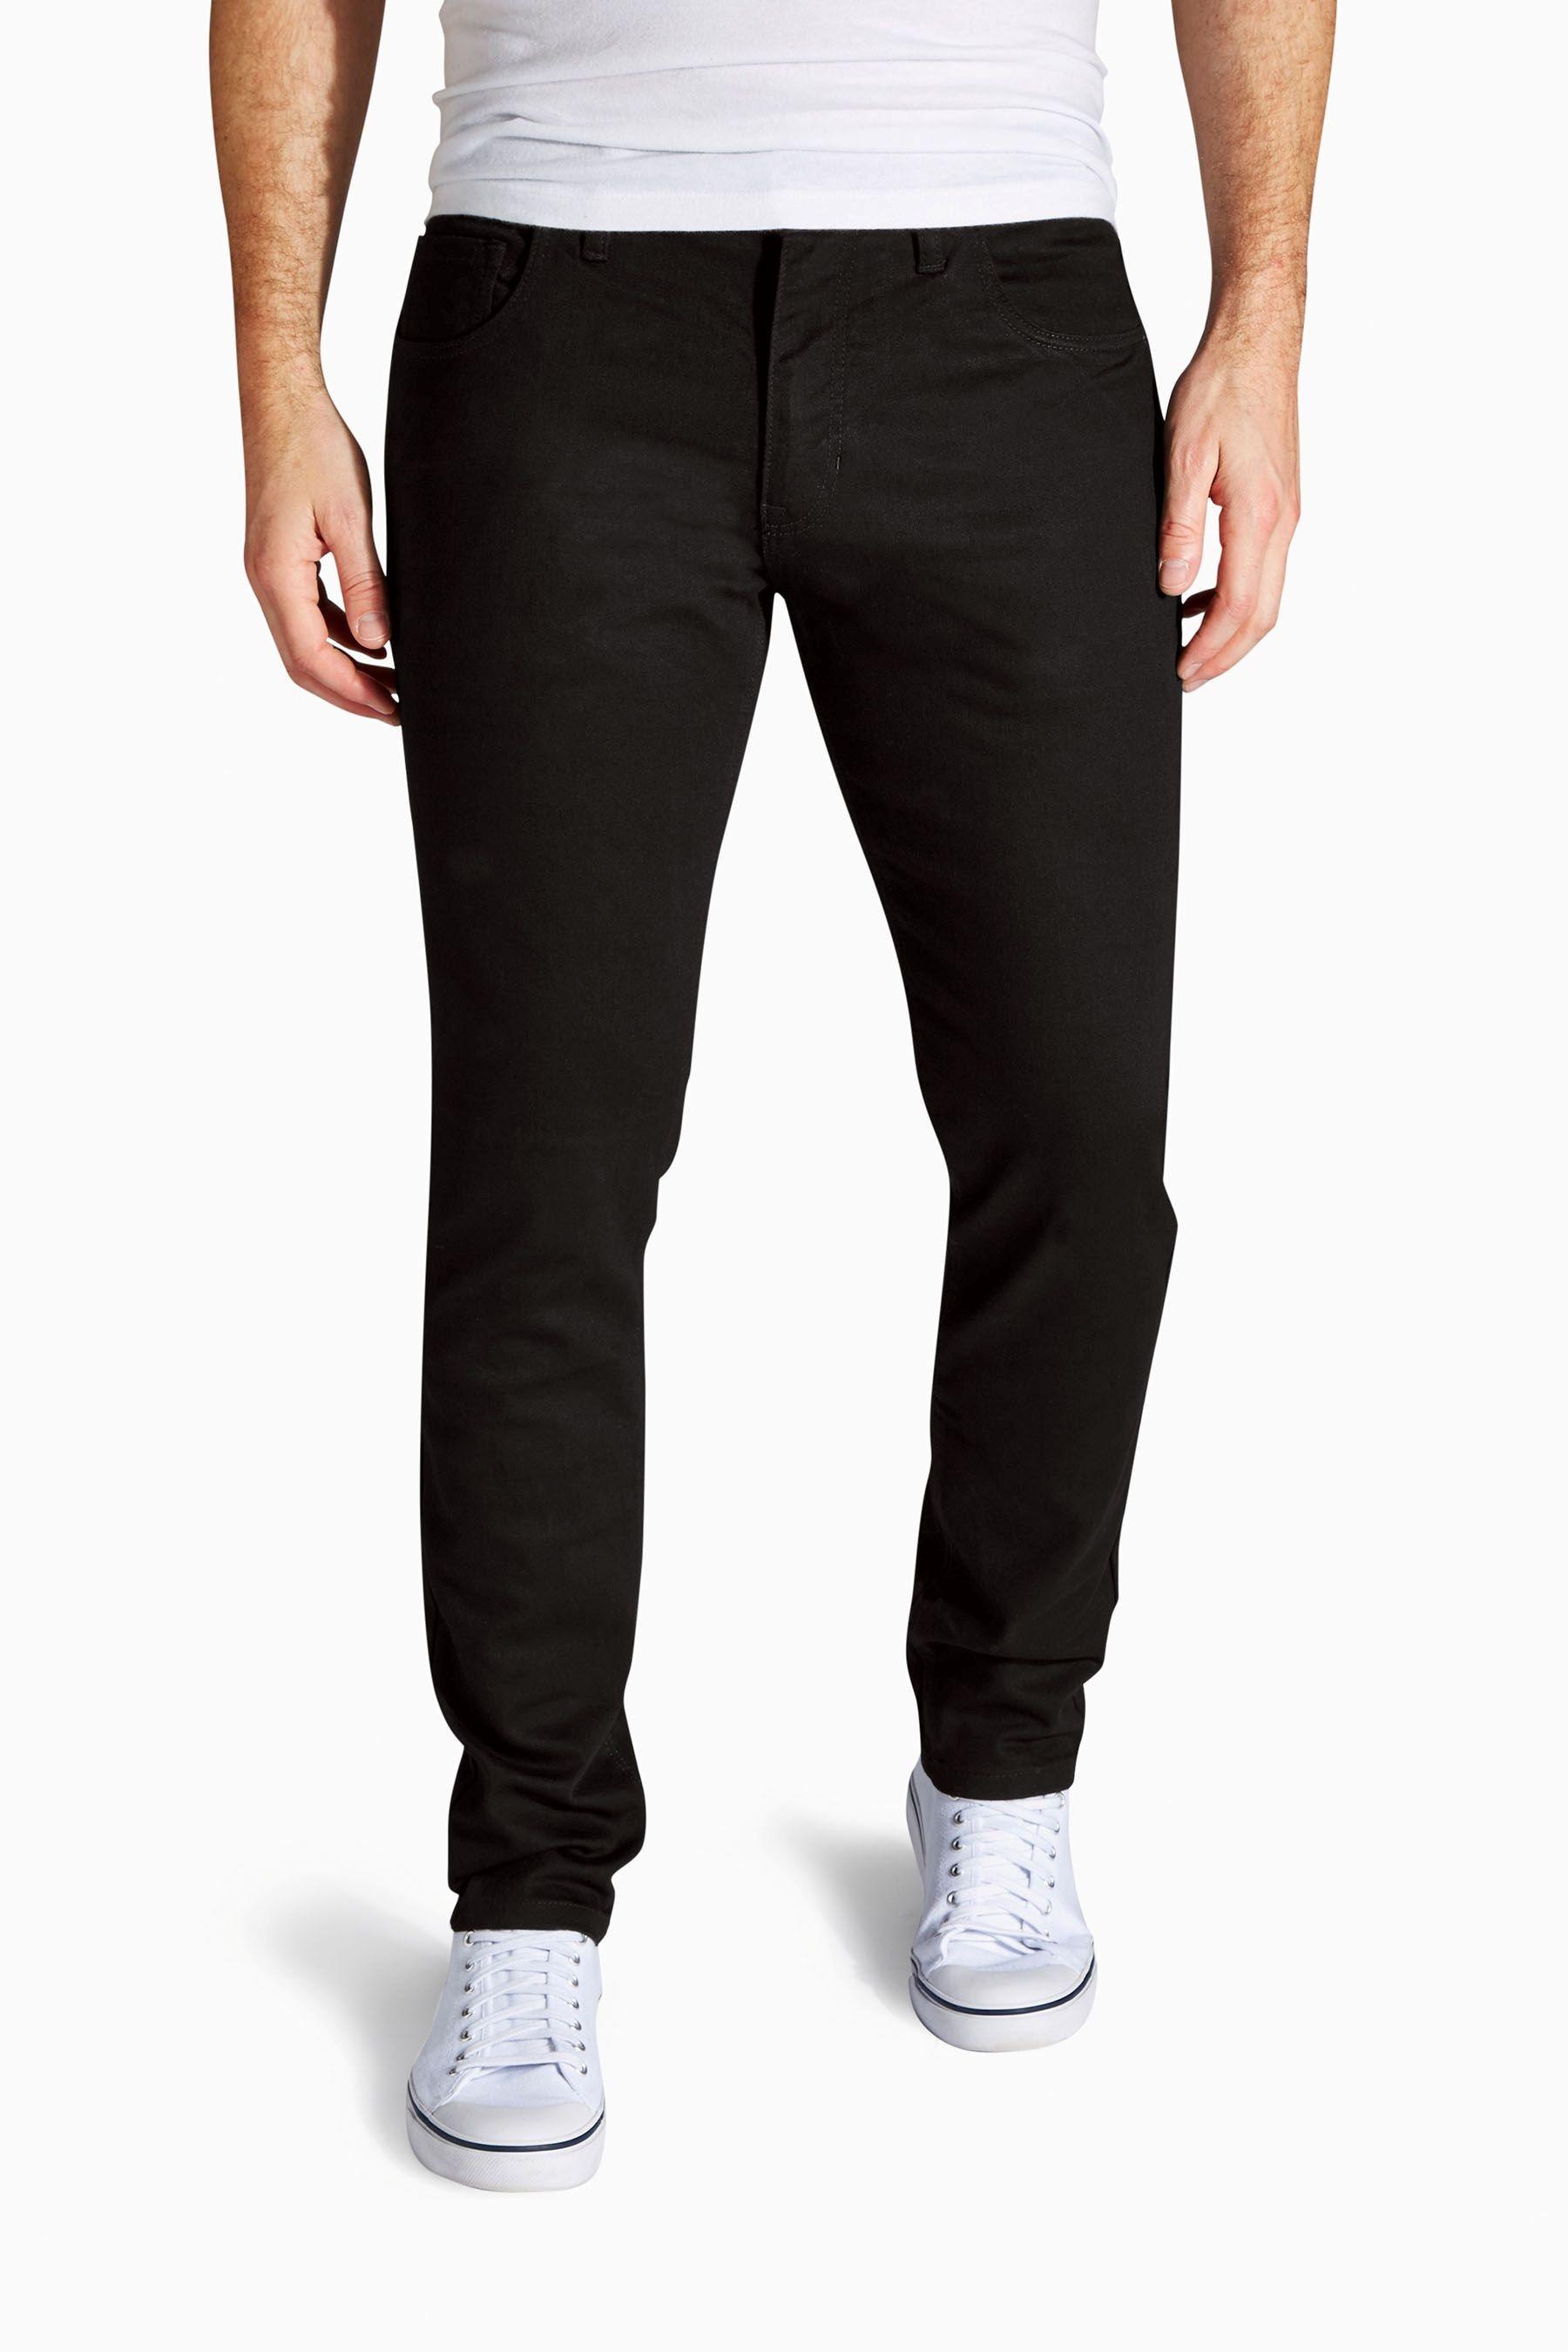 Next Skinny-Fit Black Denim Stretch-Jeans